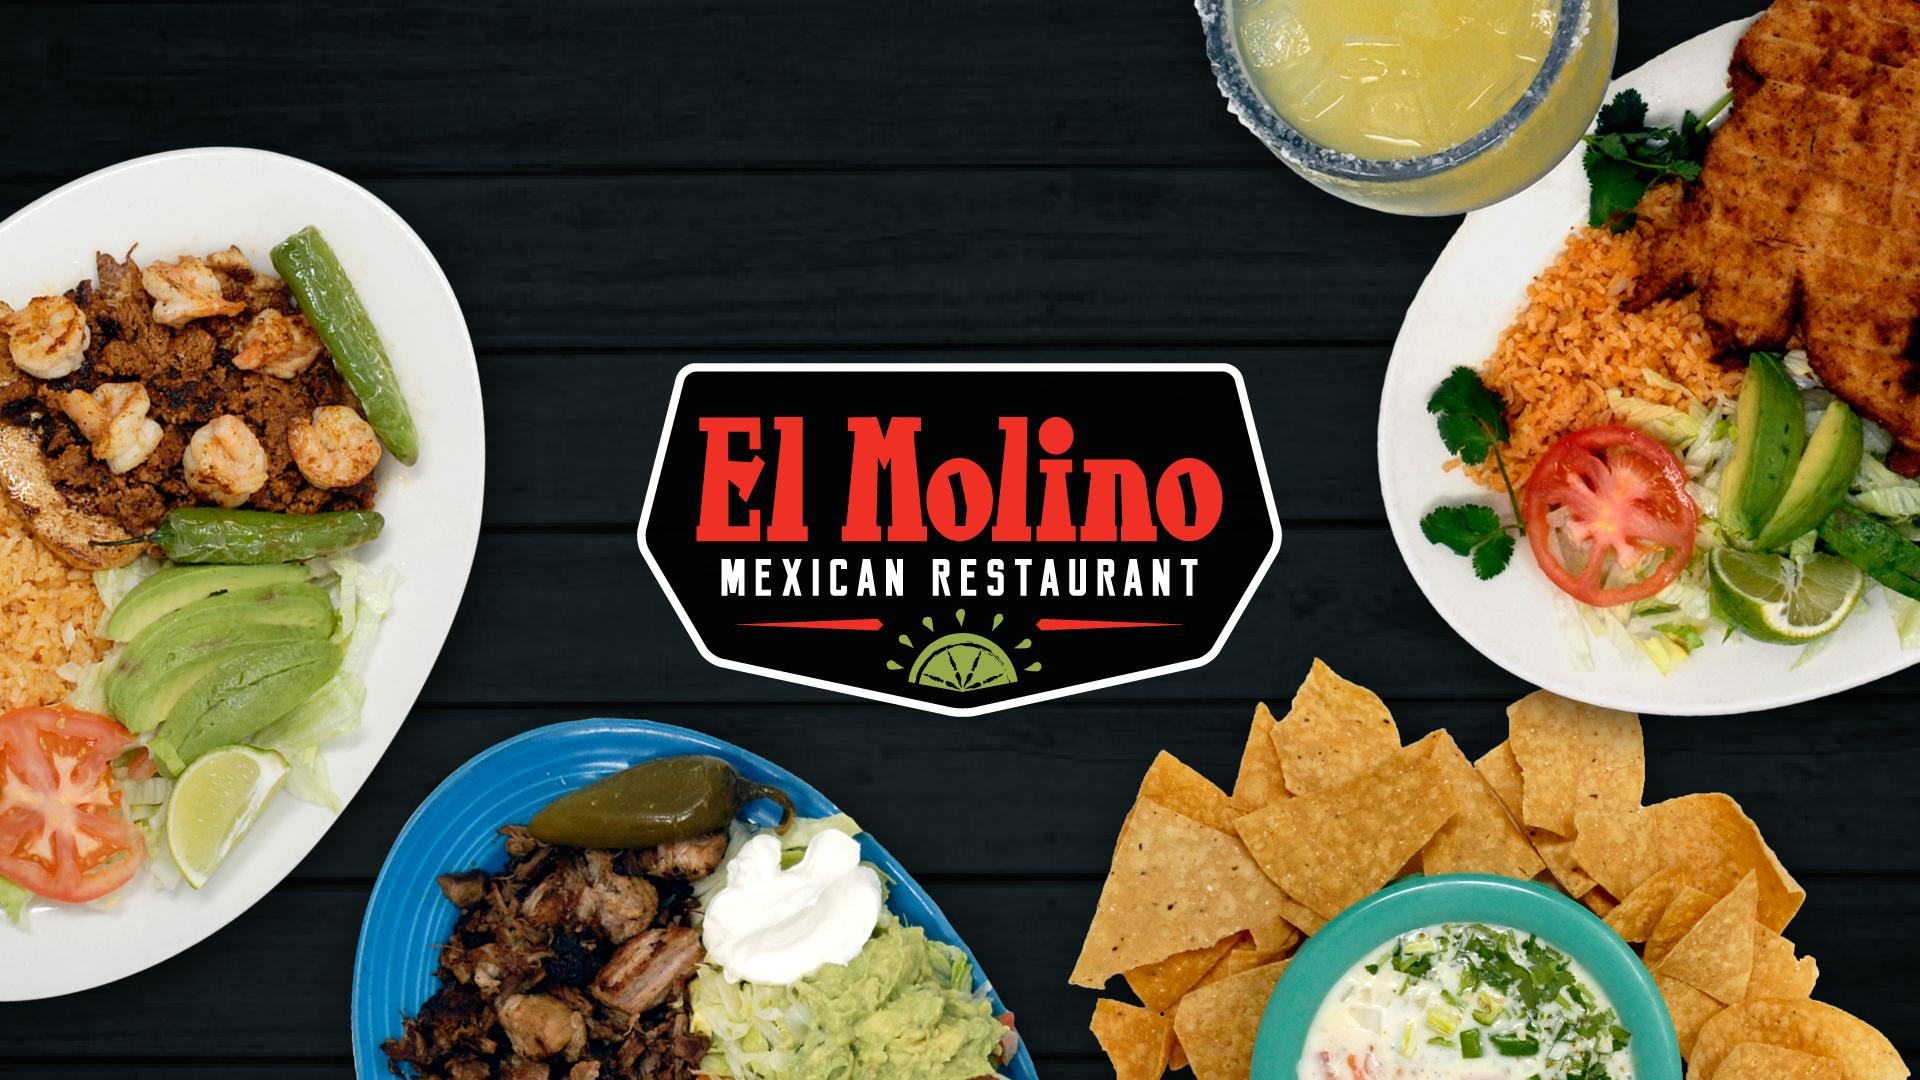 El-Molino-Mexican-Restaurant_Brand-Identity_Dreamcapture_Memphis-TN